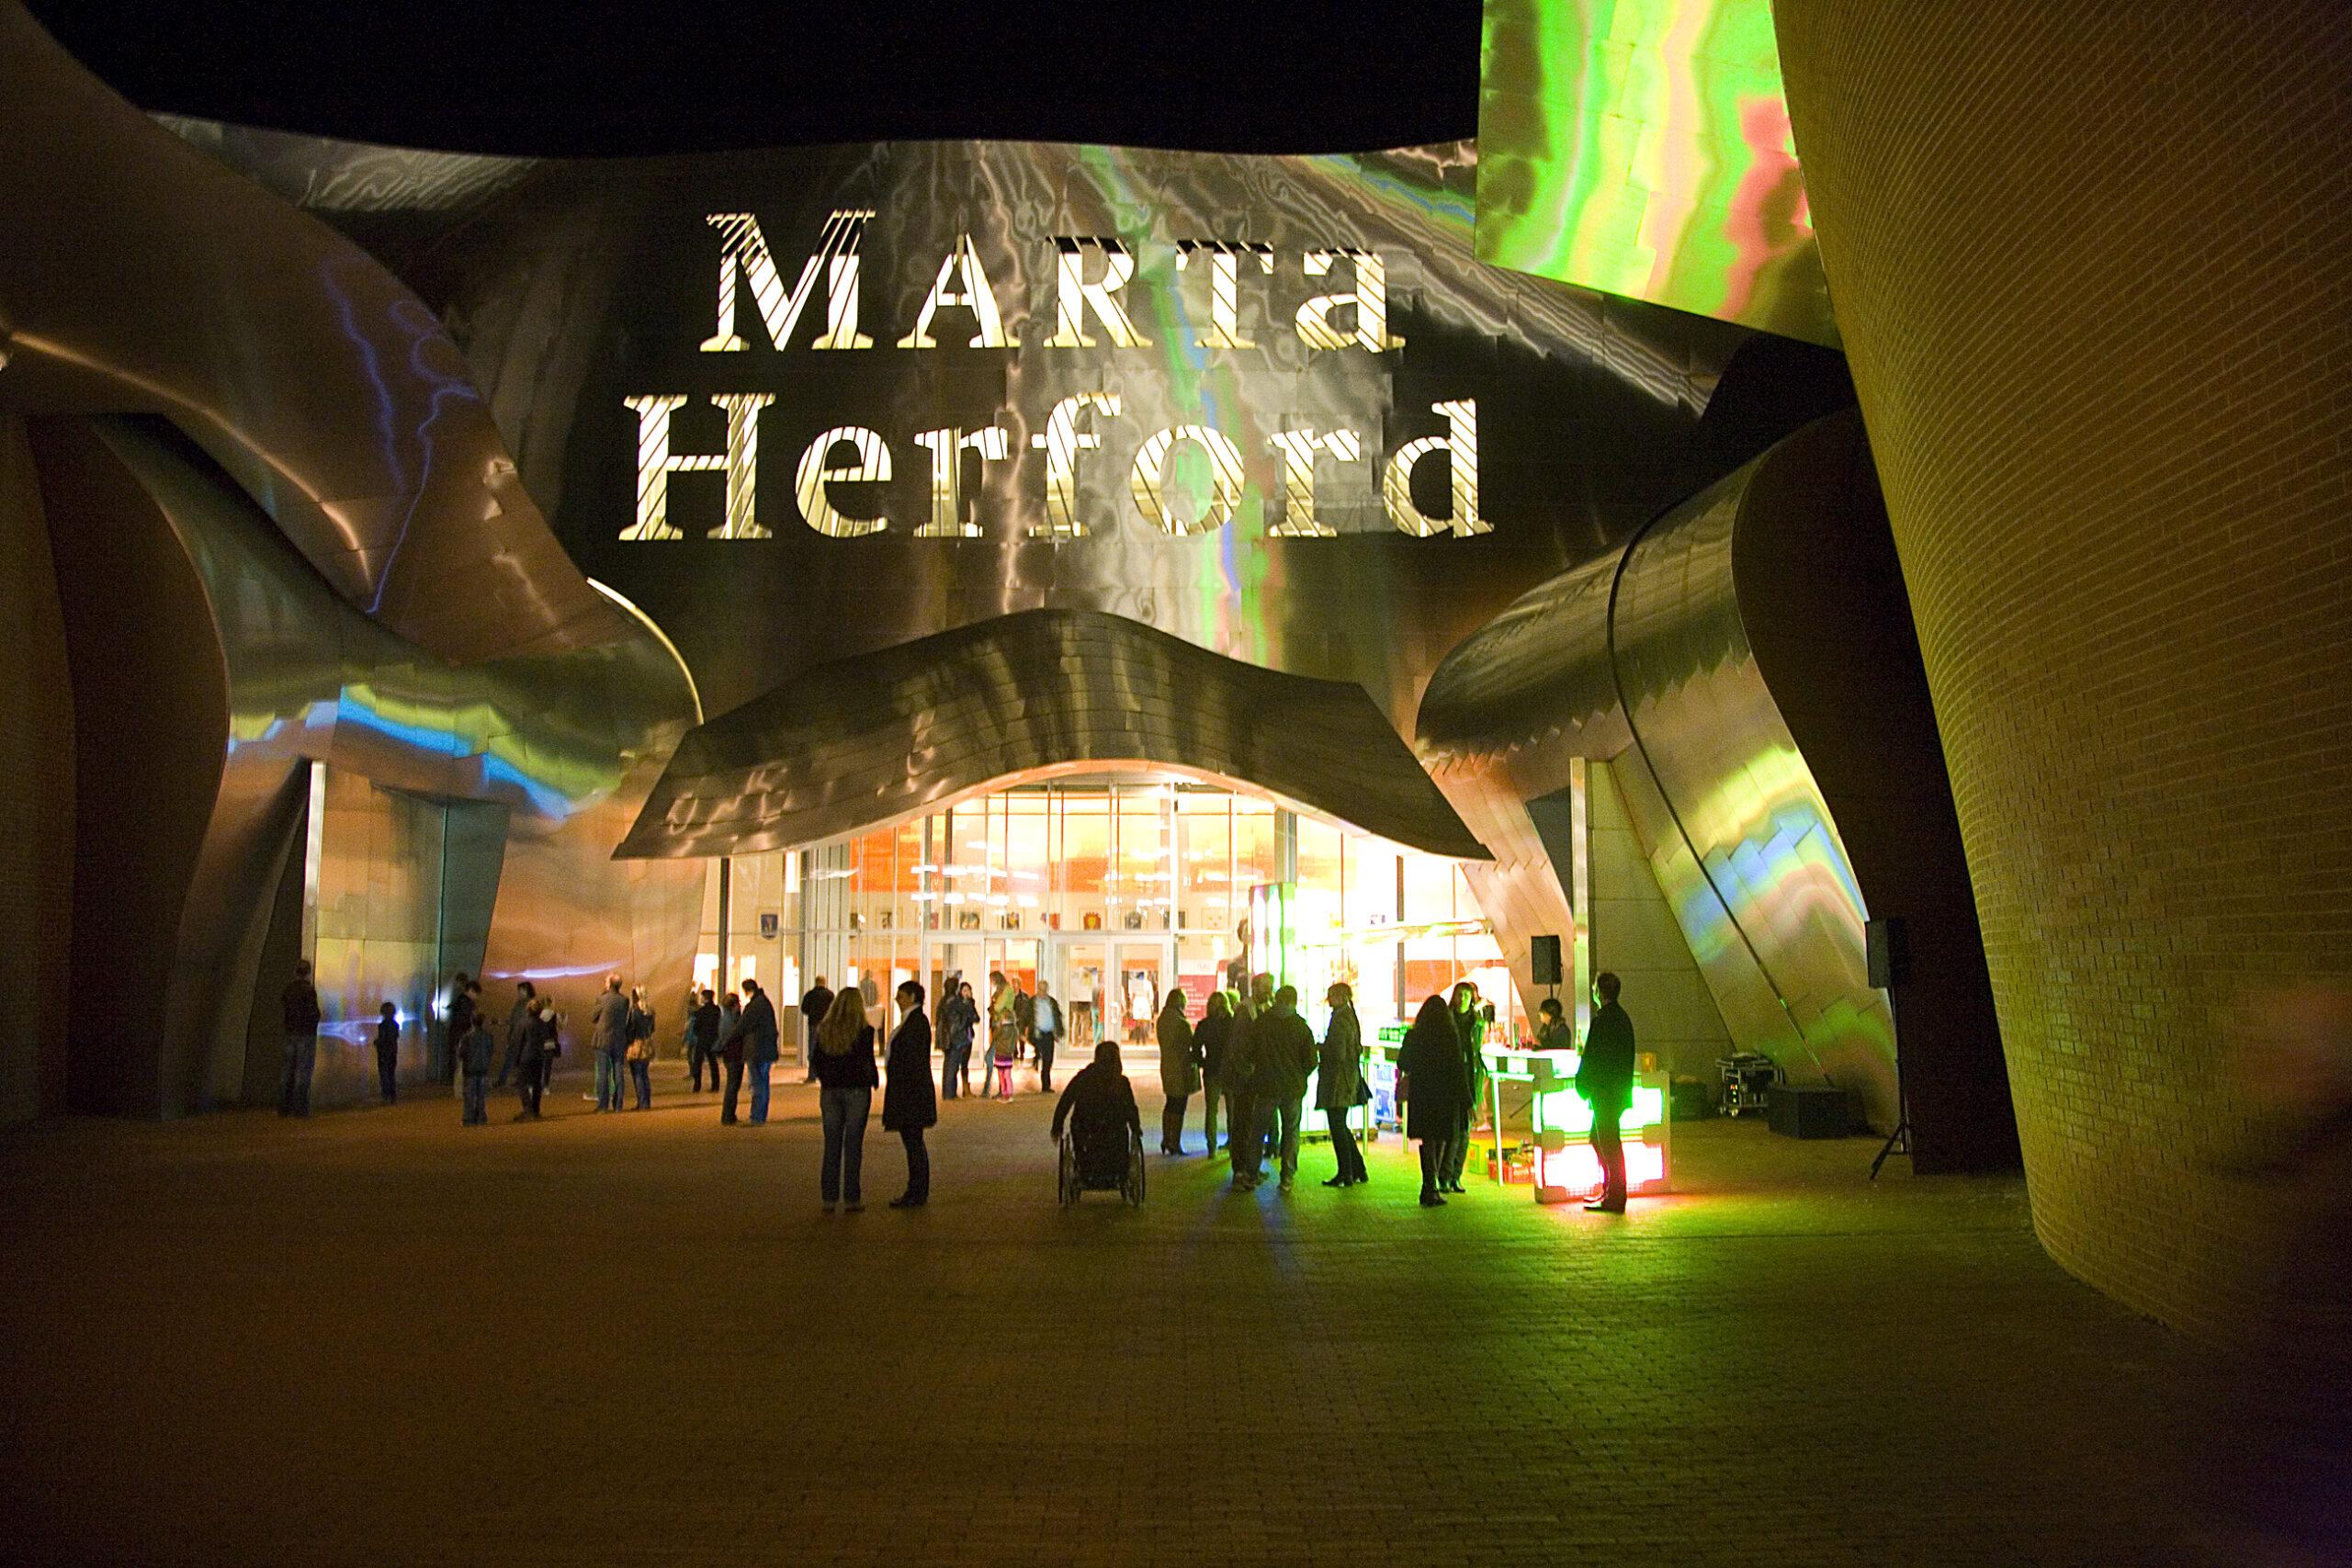 Marta Herford Kulturnacht